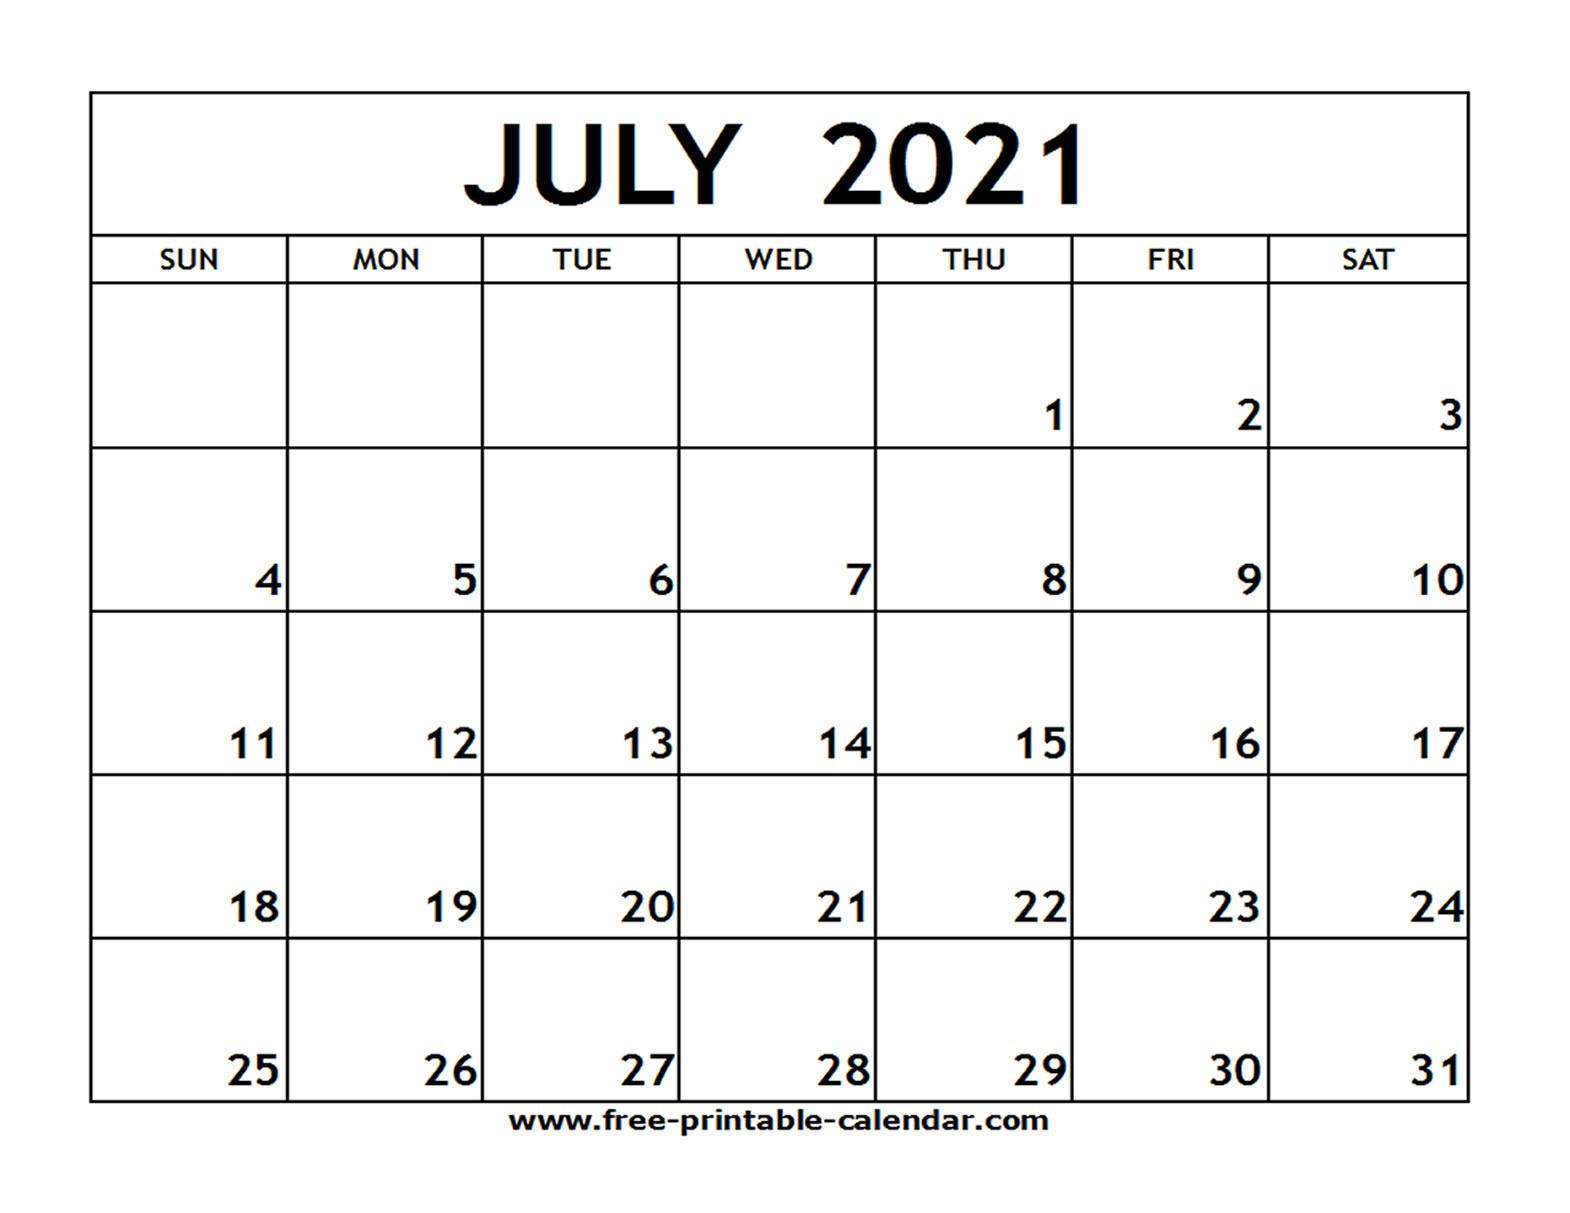 Printable July 2021 Calendar With Lines | Free Printable